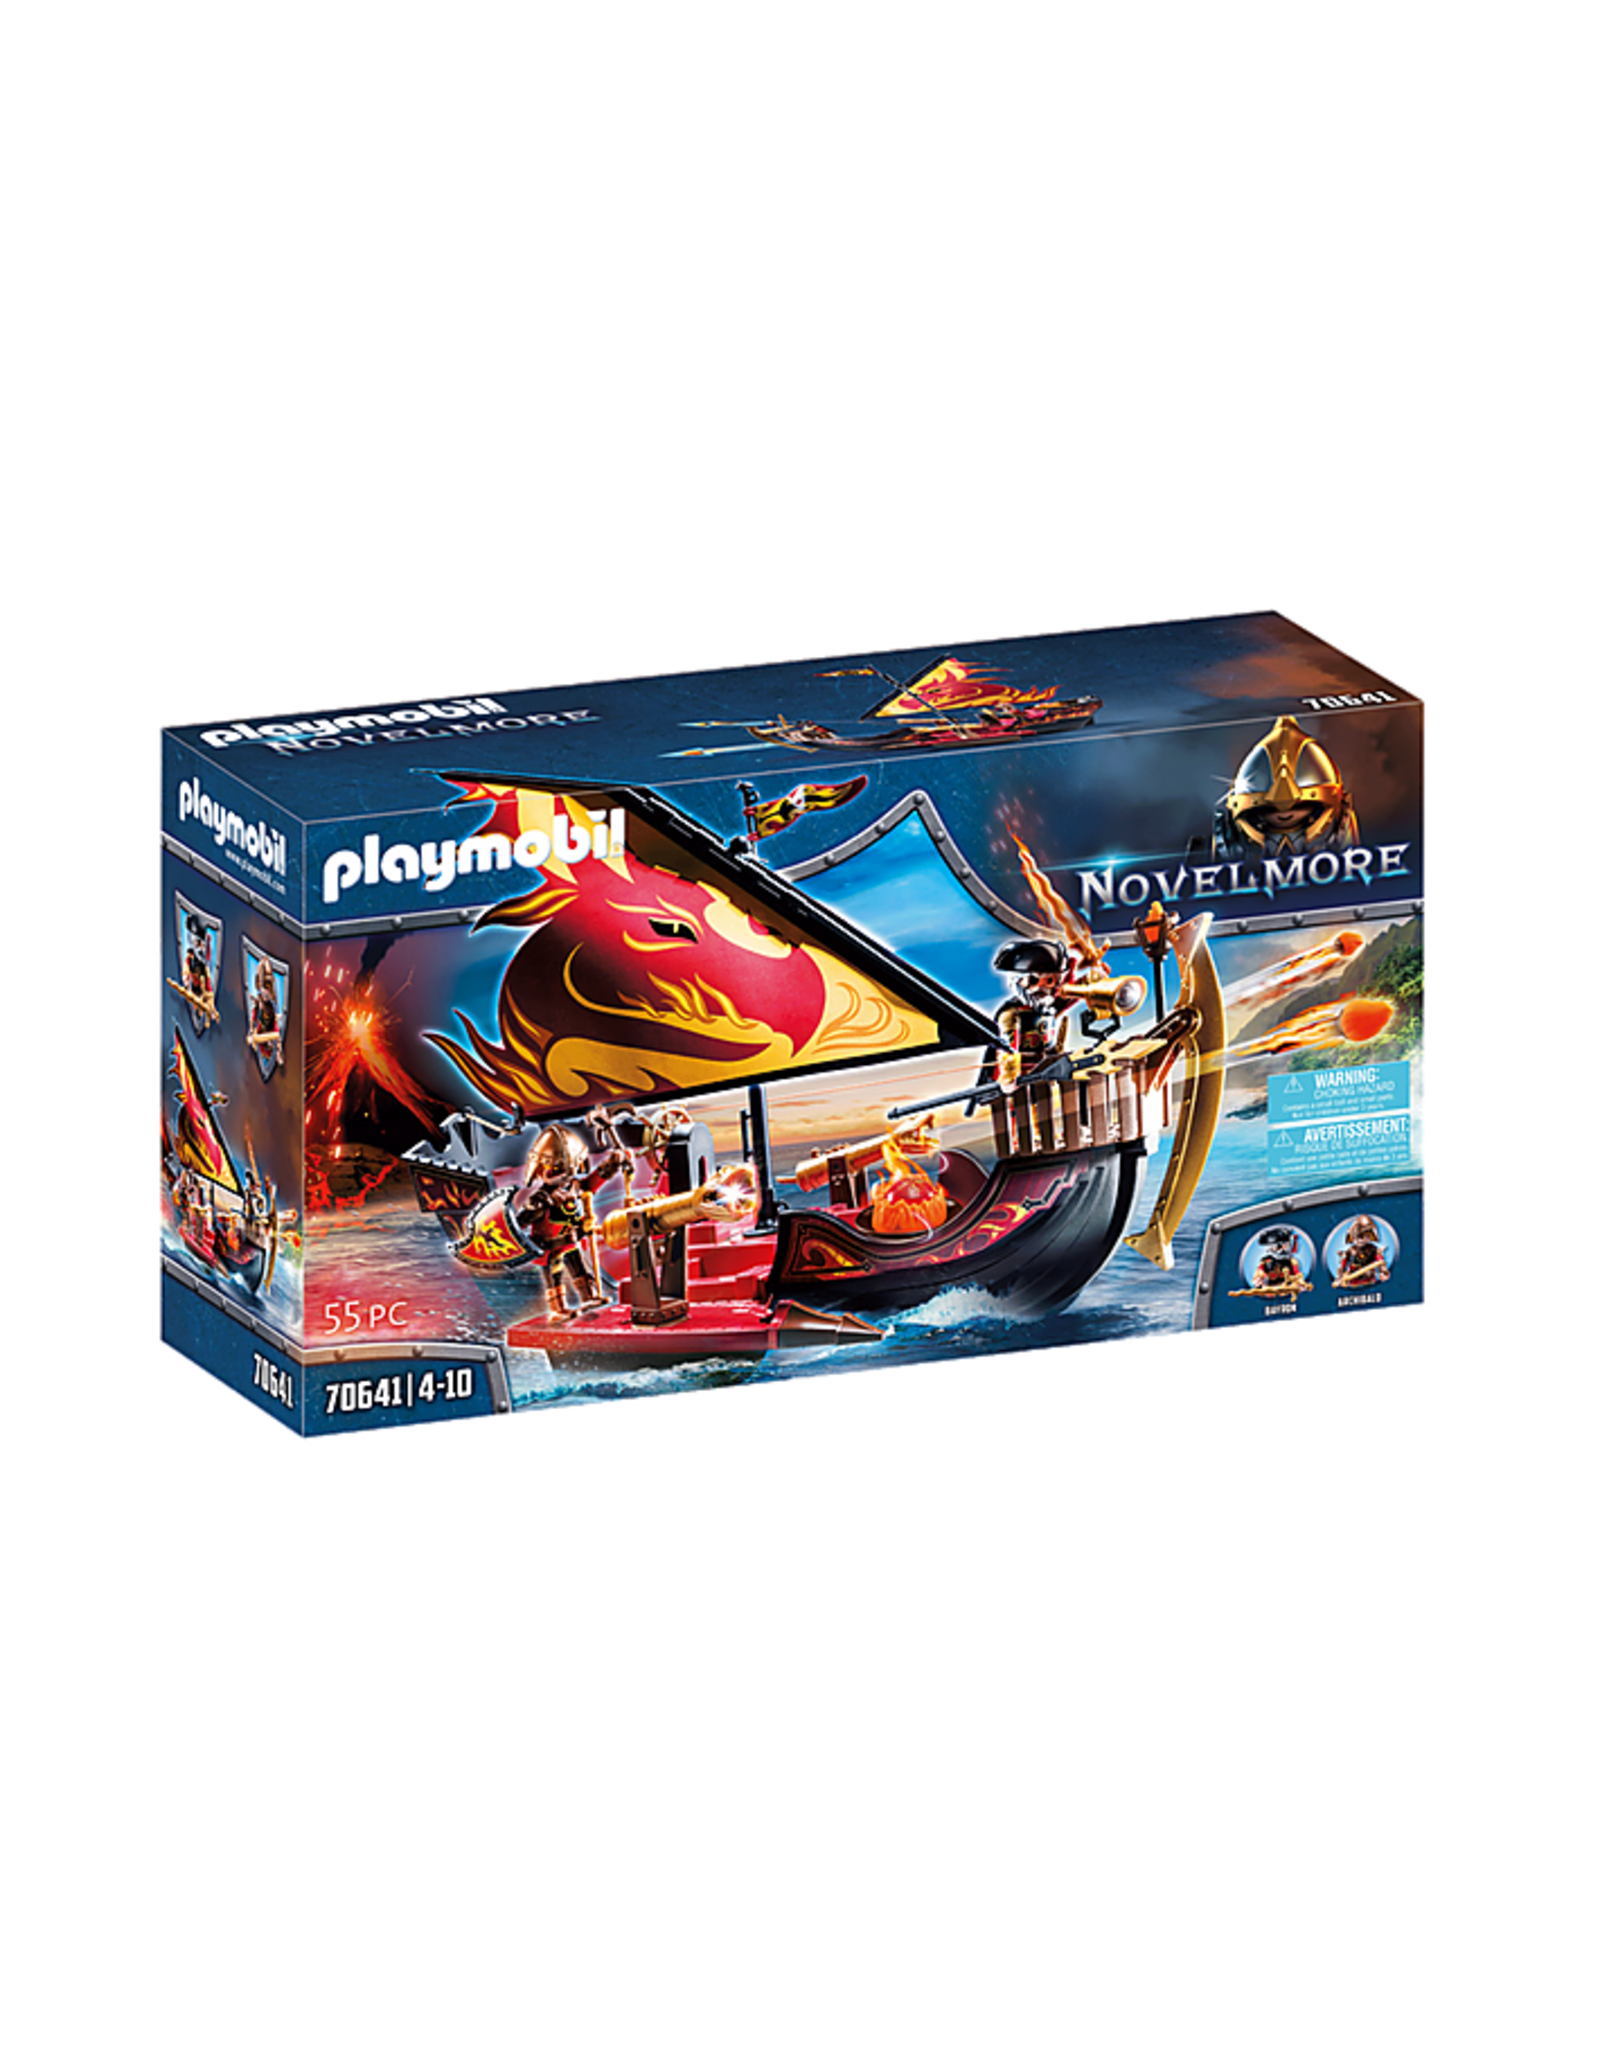 Playmobil Novelmore Burnham Raiders Fire Ship